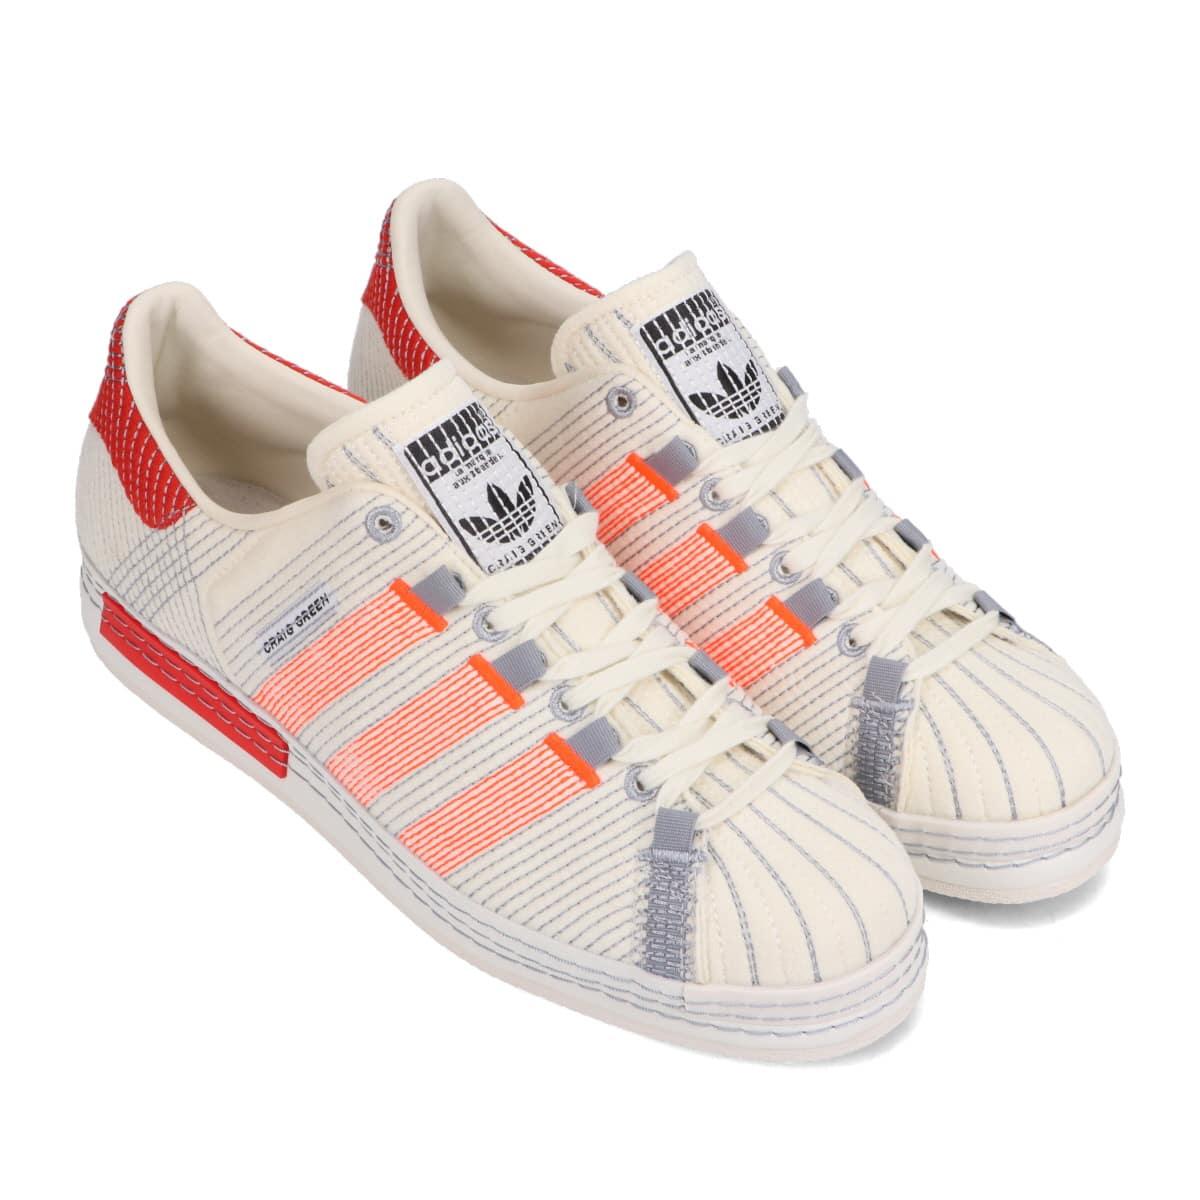 adidas CG SS OFF WHITE/BRIGHT RED/GREY THREE 20FW-S_photo_large